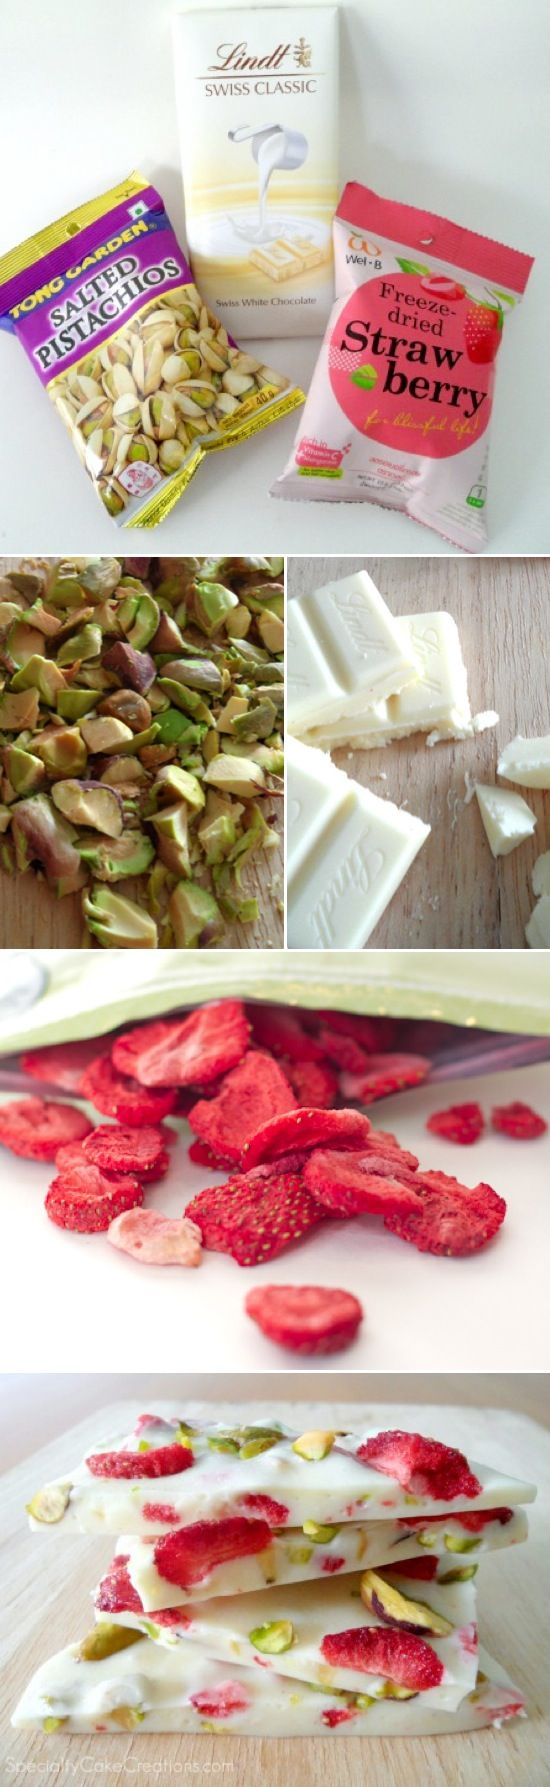 White chocolate, strawberry and pistachio bark